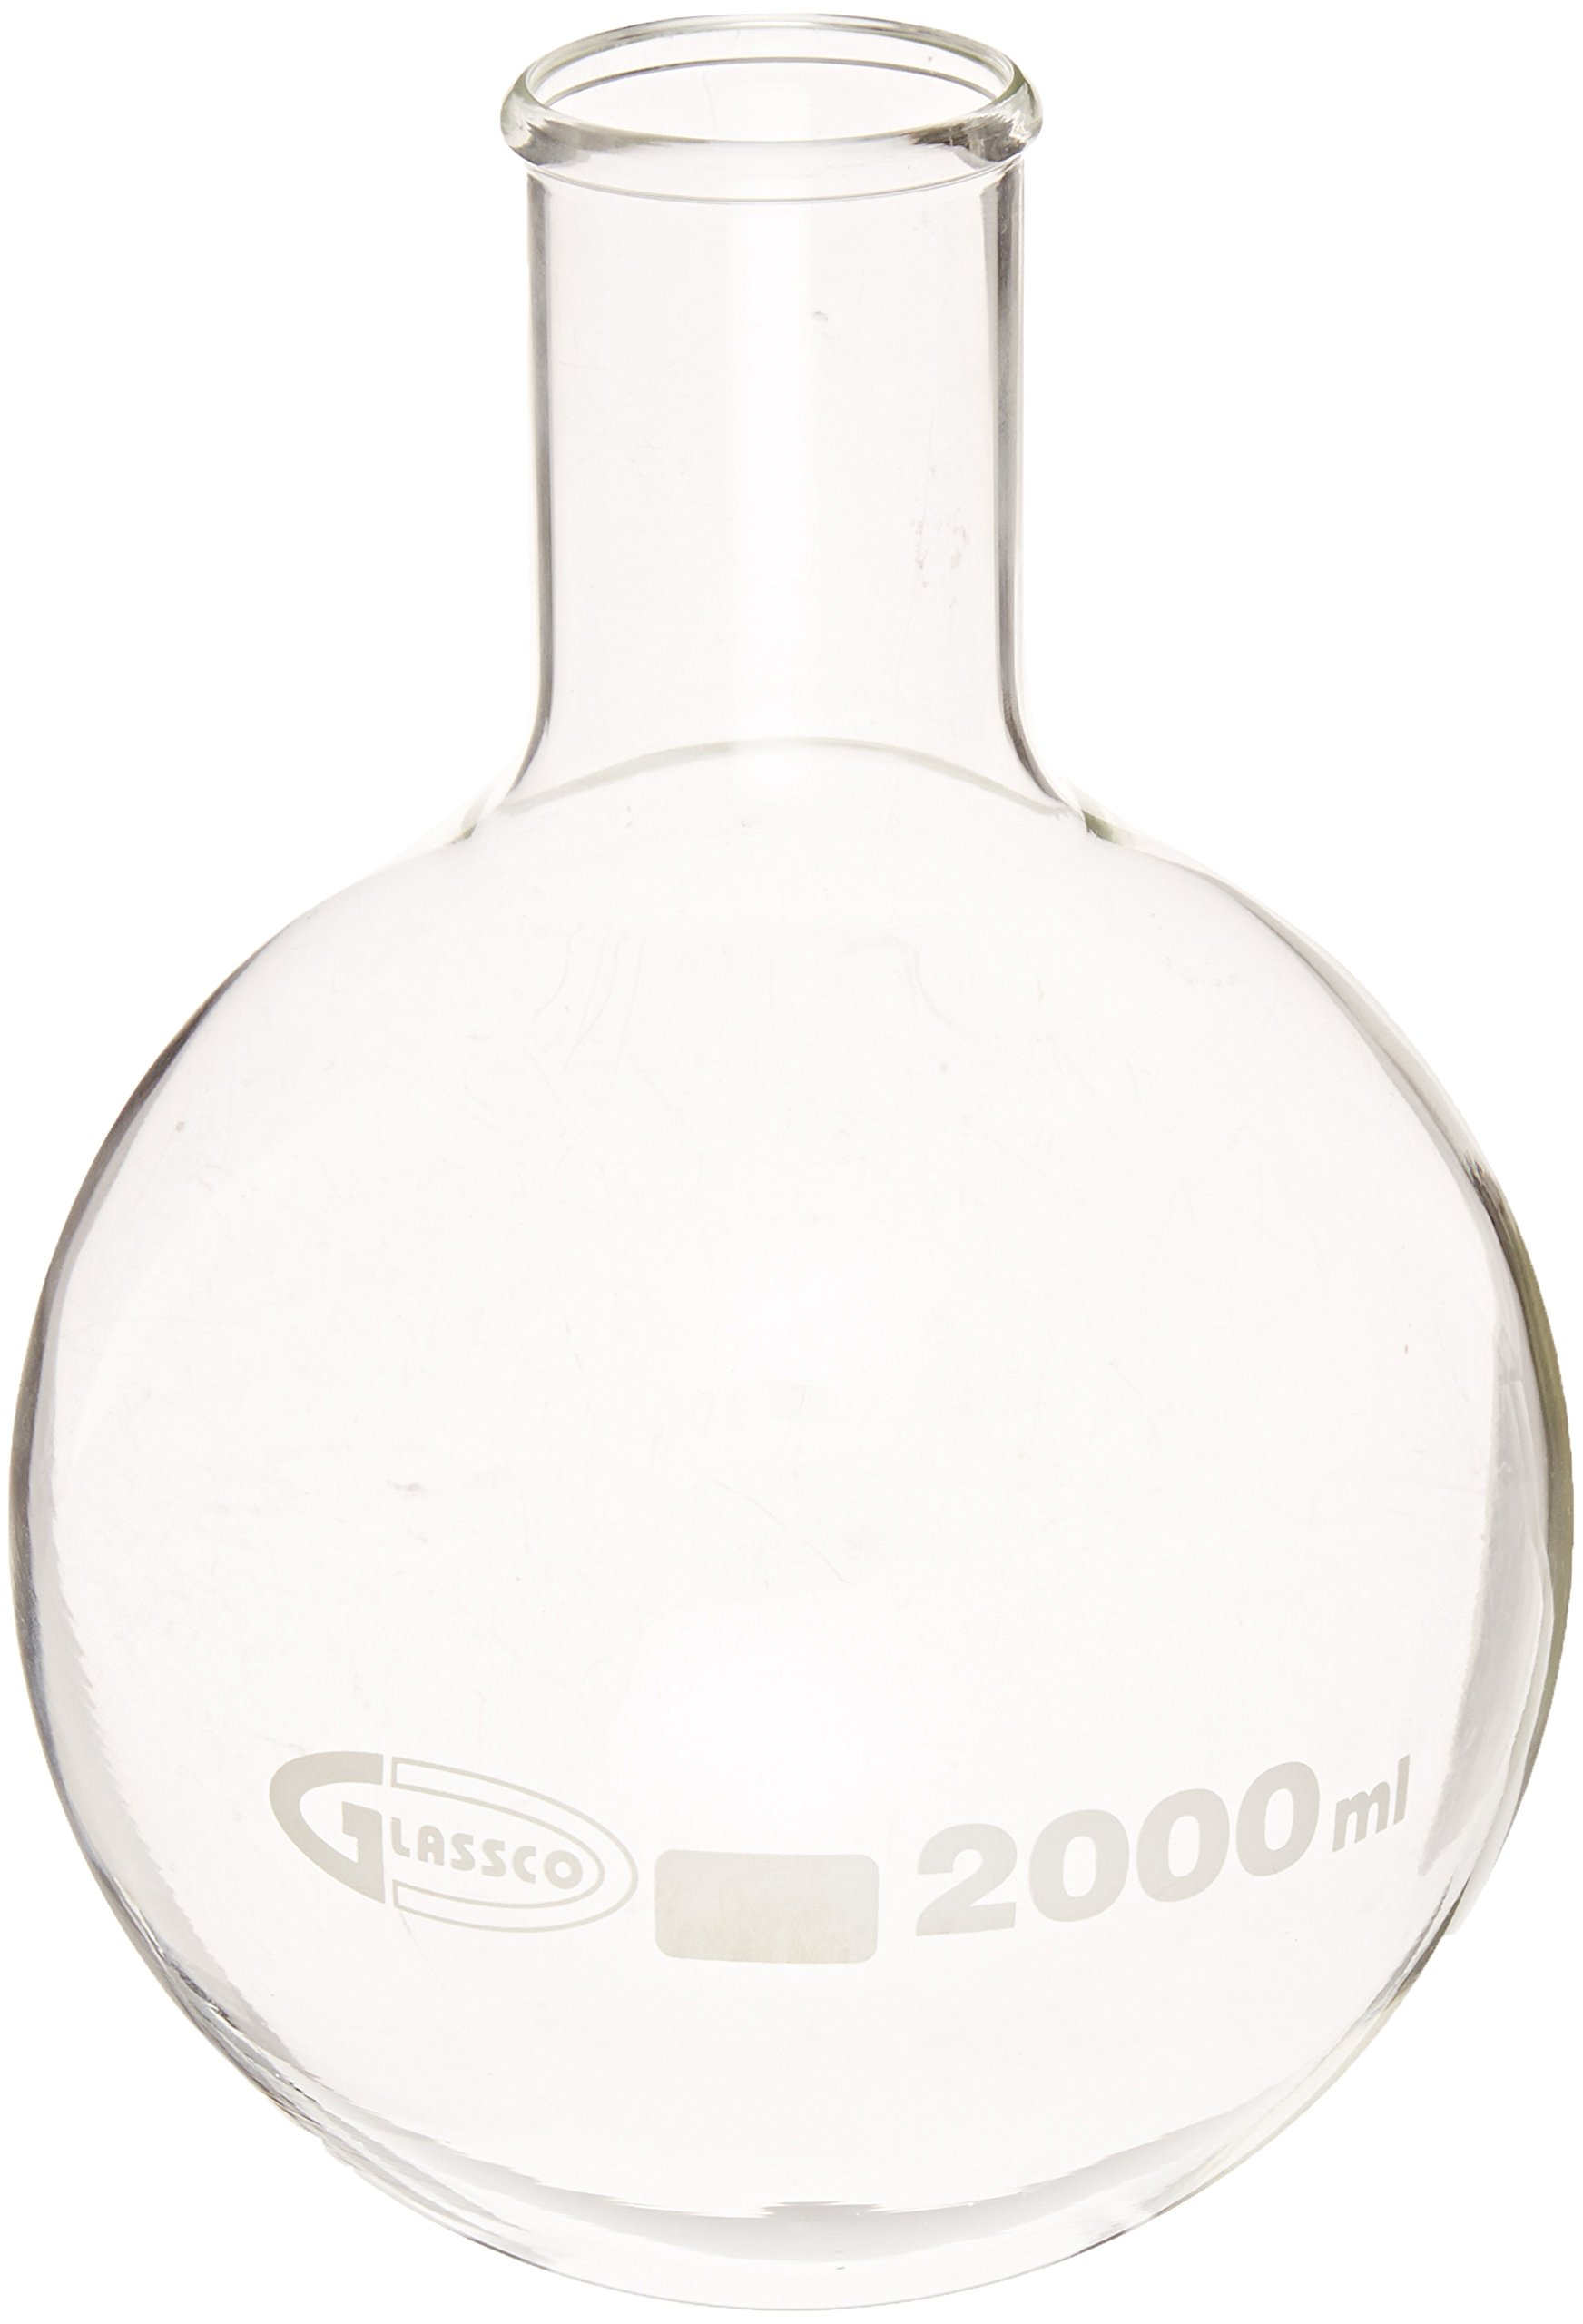 United Scientific FG4260-2000 Borosilicate Glass Round Bottom Boiling Flask, 2000ml Capacity